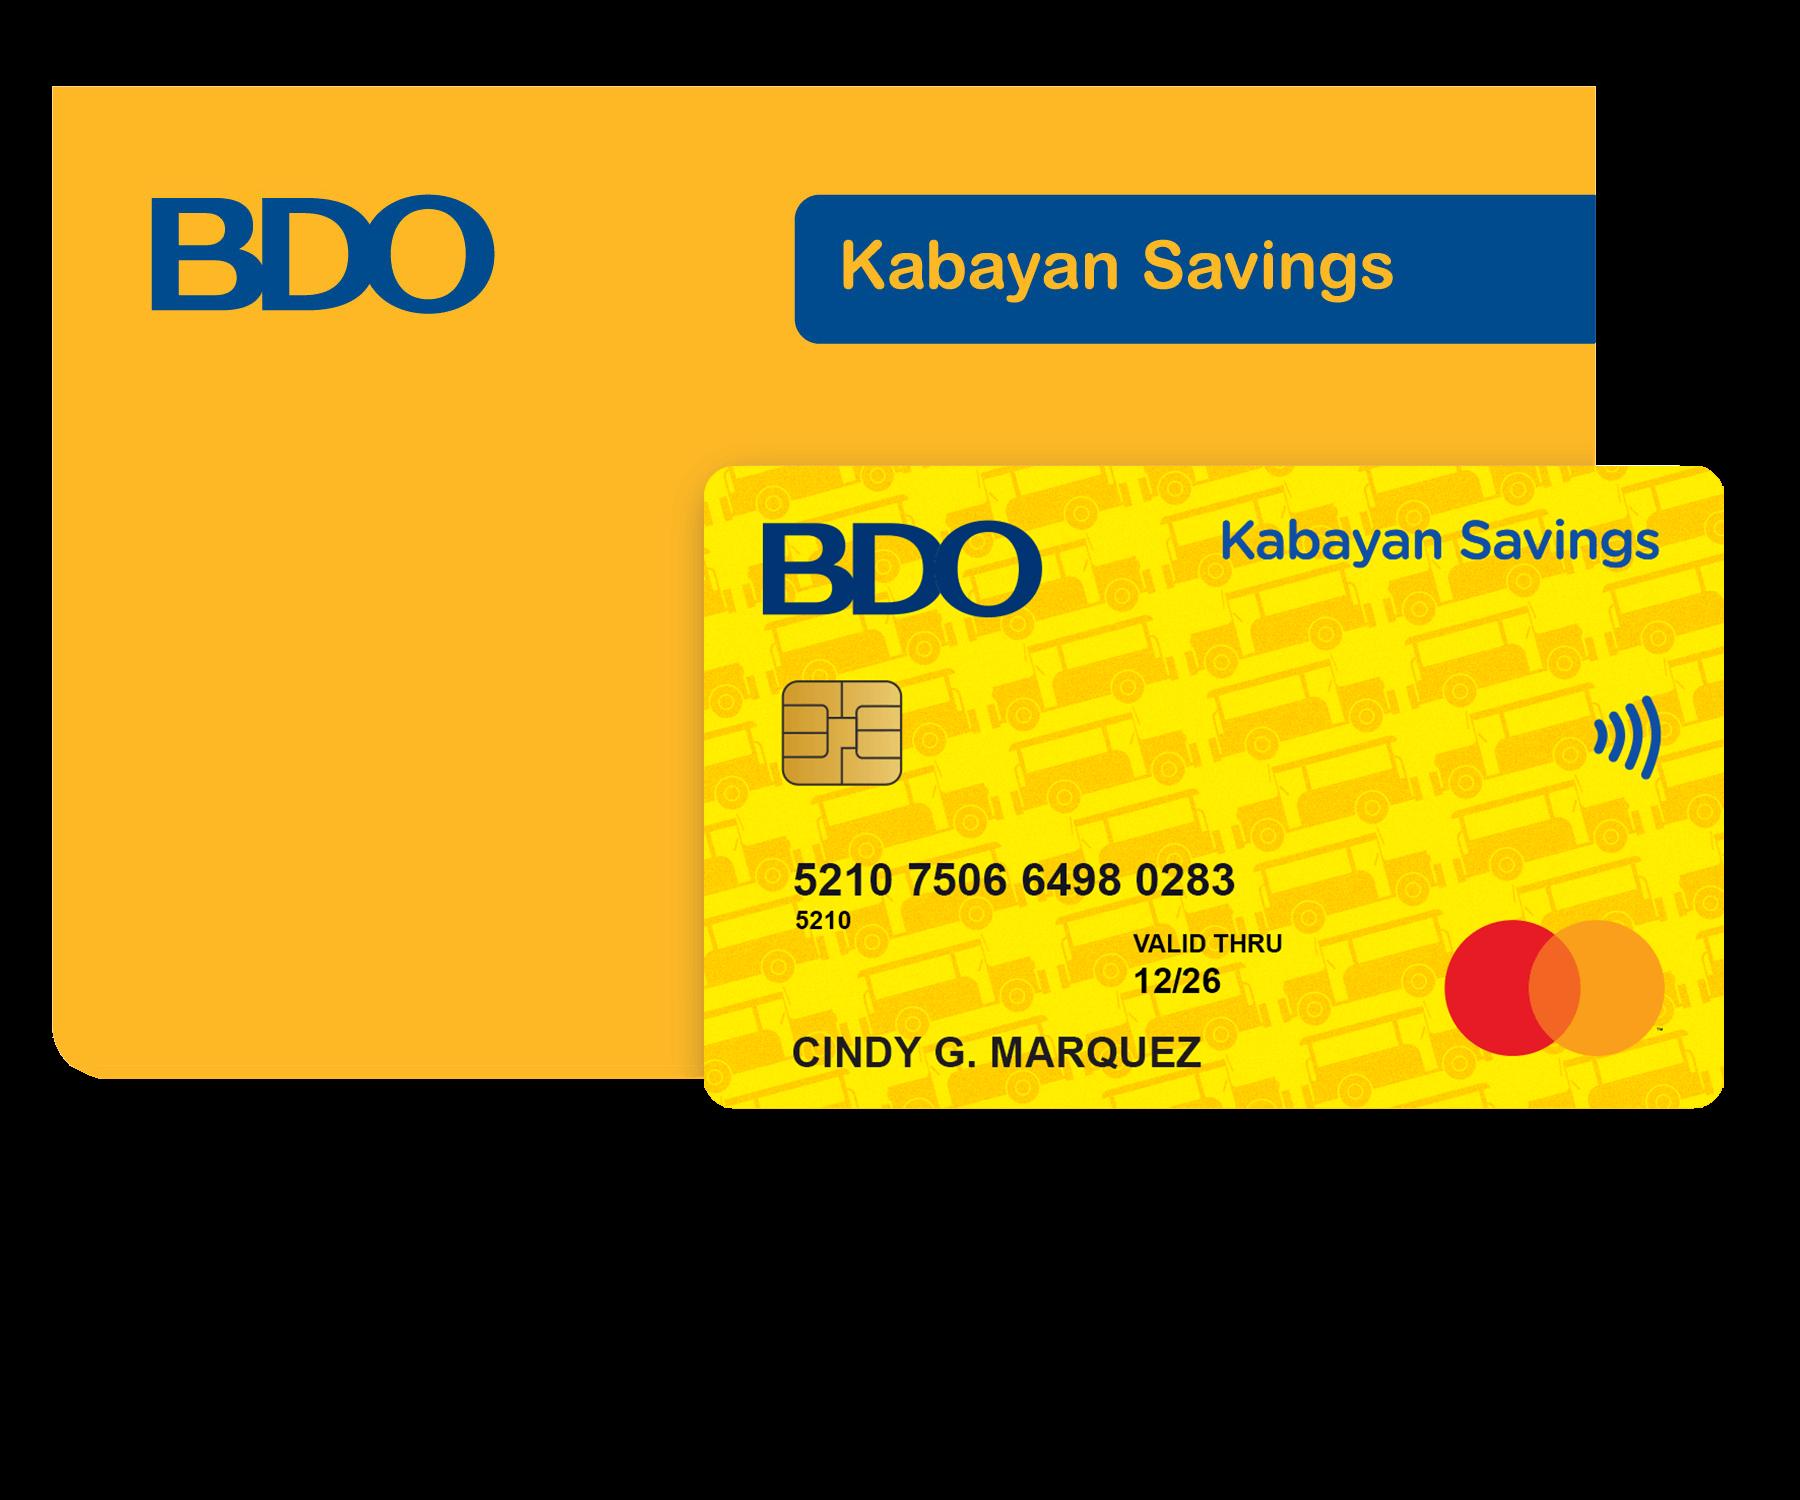 Send money to BDO